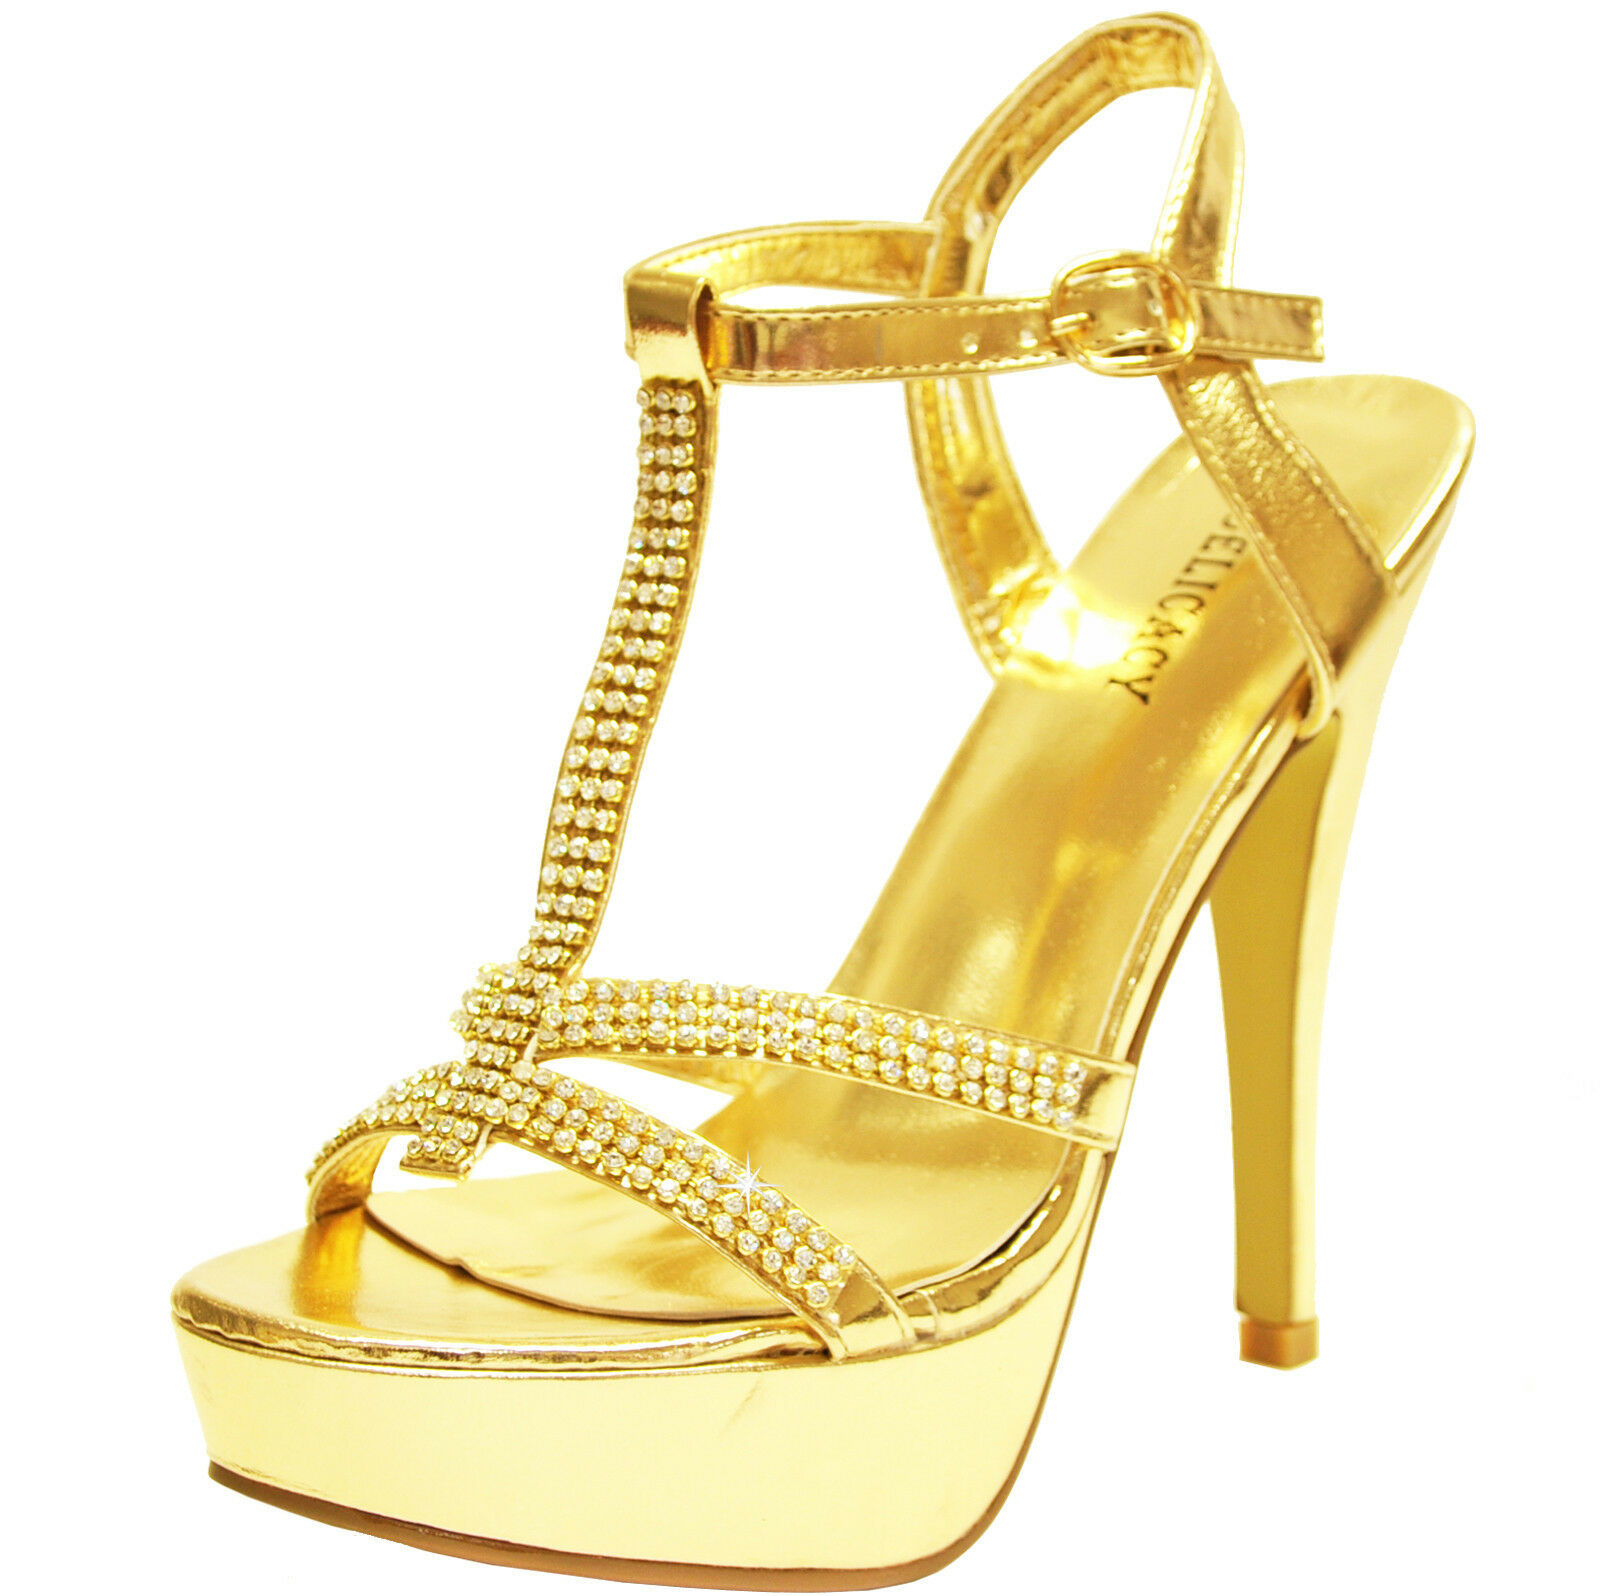 New women shoes rhinestones stilettos open toe formal evening prom wedding gold